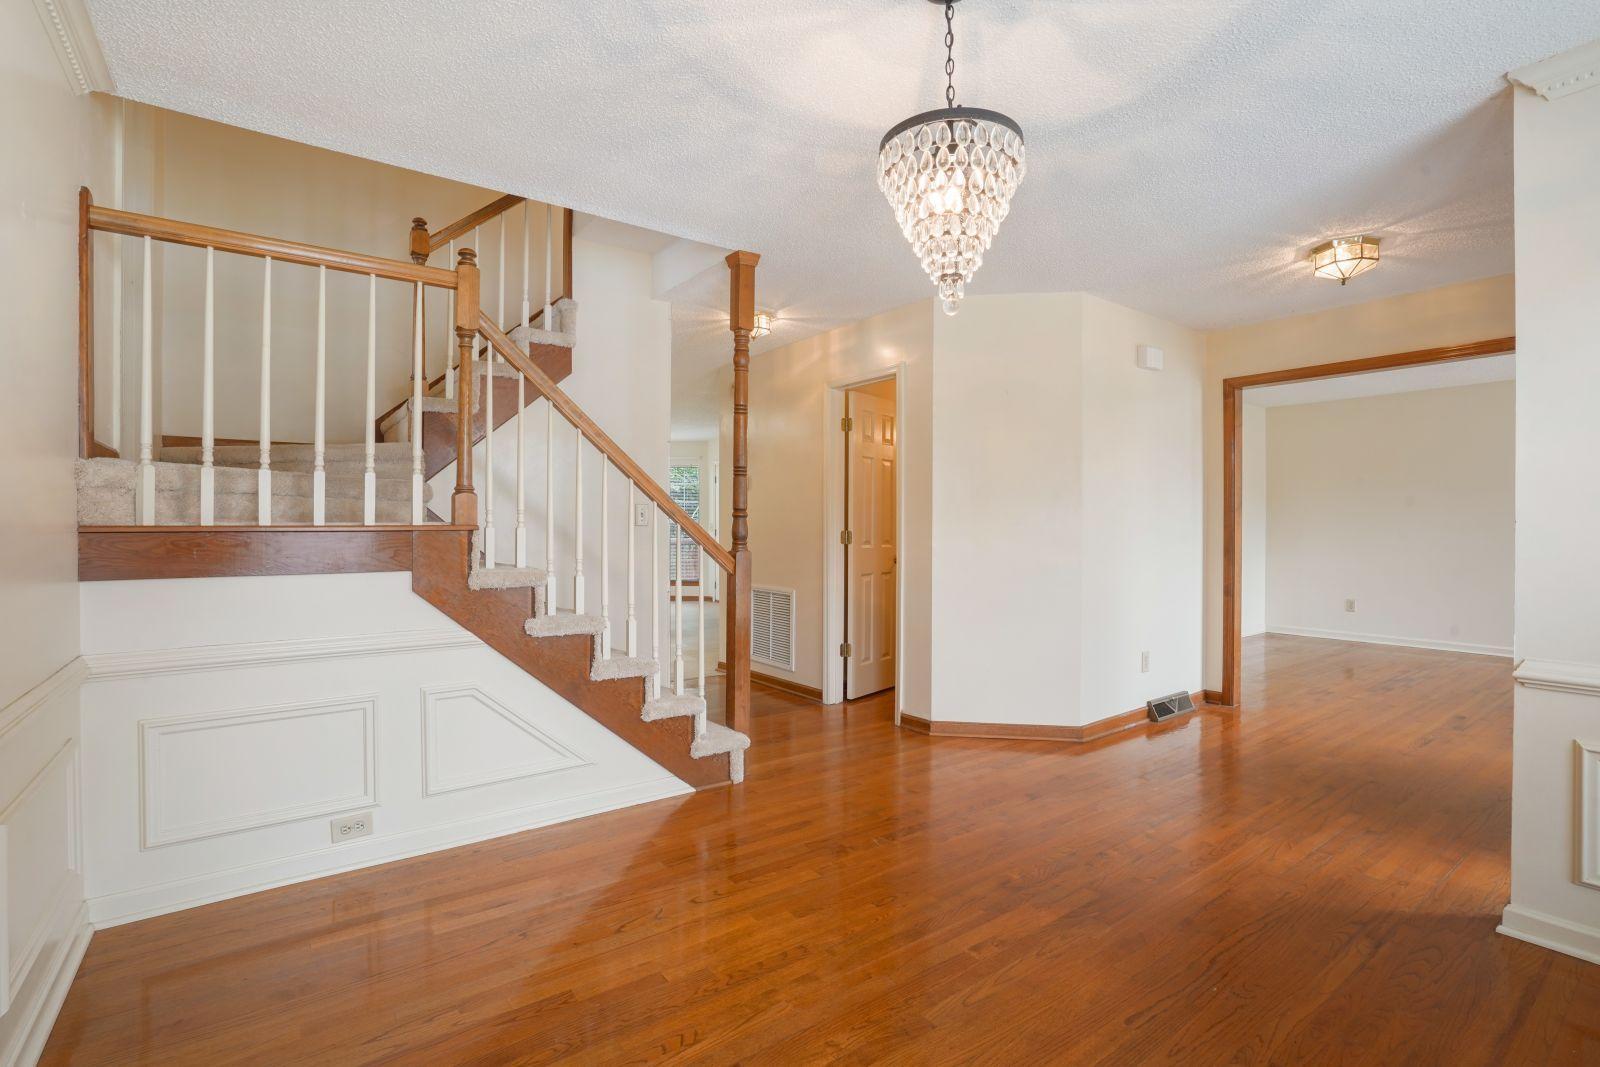 Crowfield Plantation Homes For Sale - 161 Belleplaine, Goose Creek, SC - 32